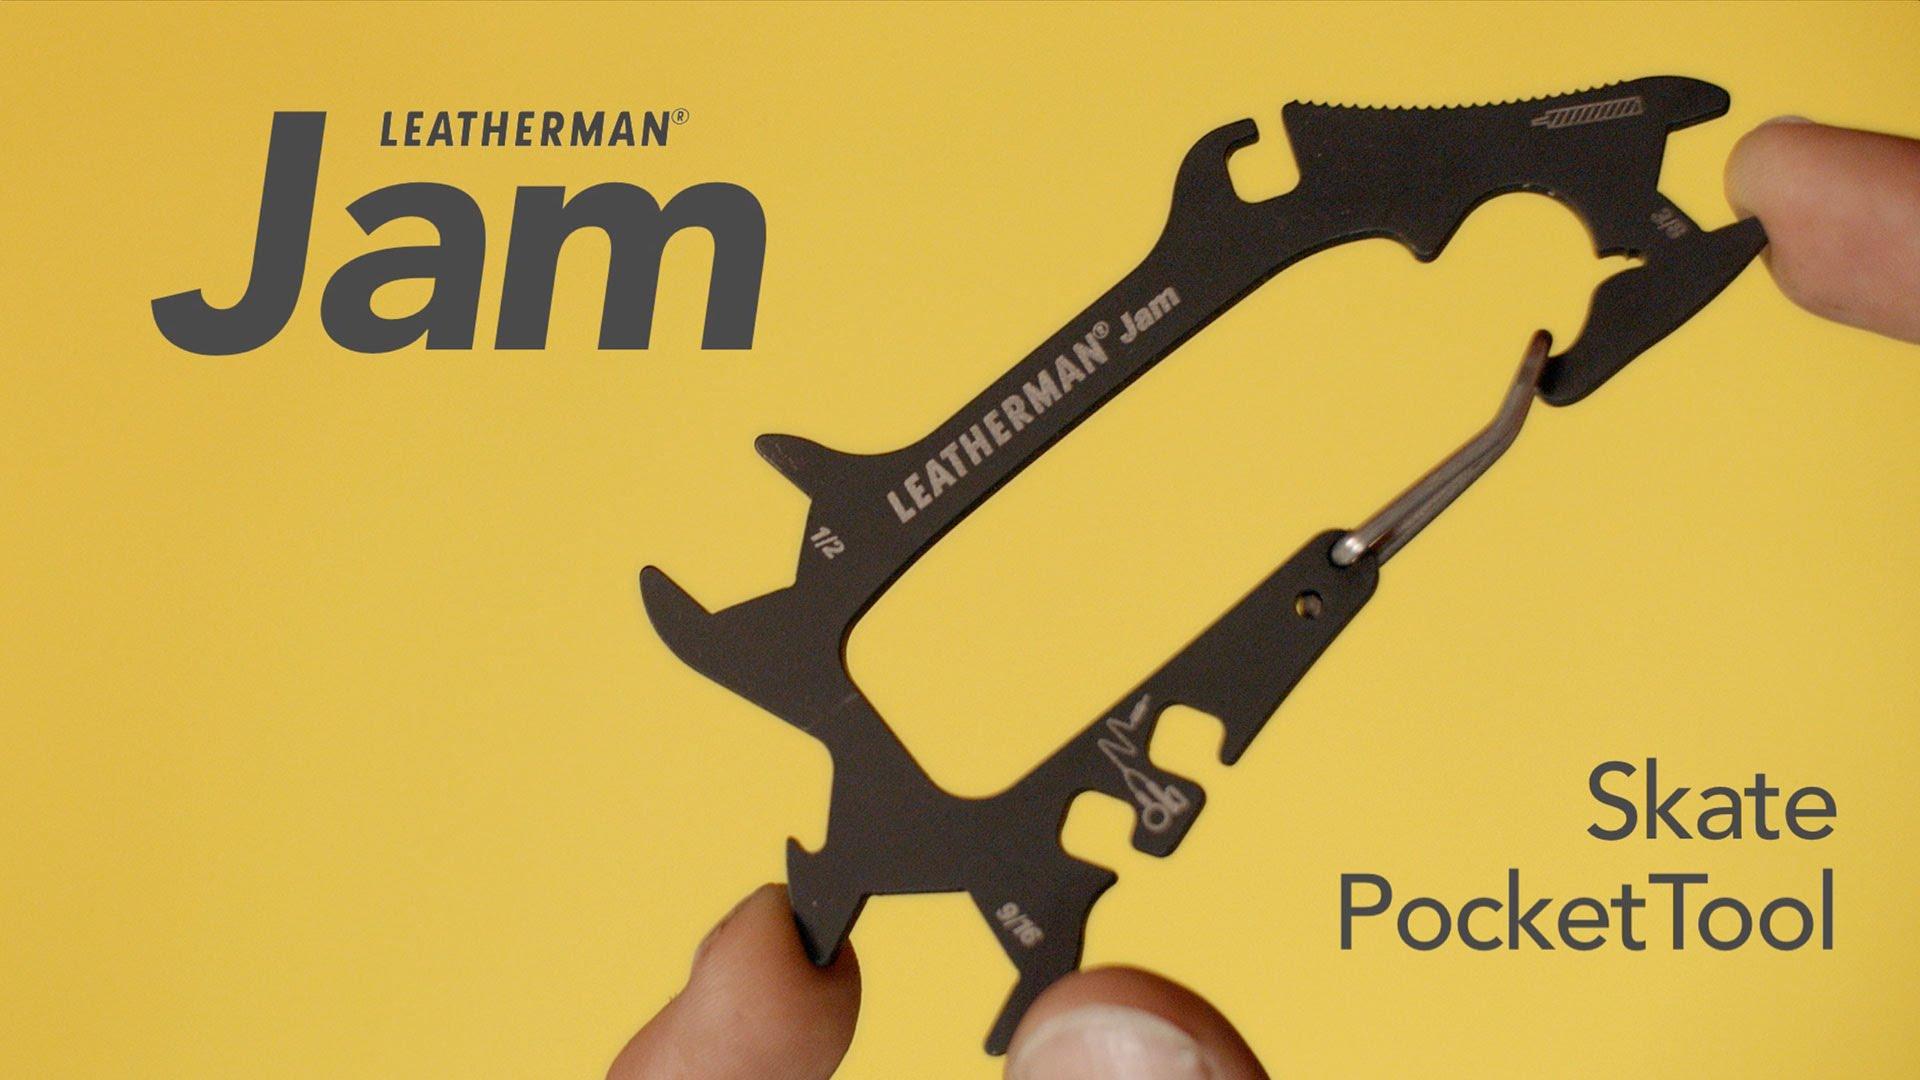 Leatherman Jam